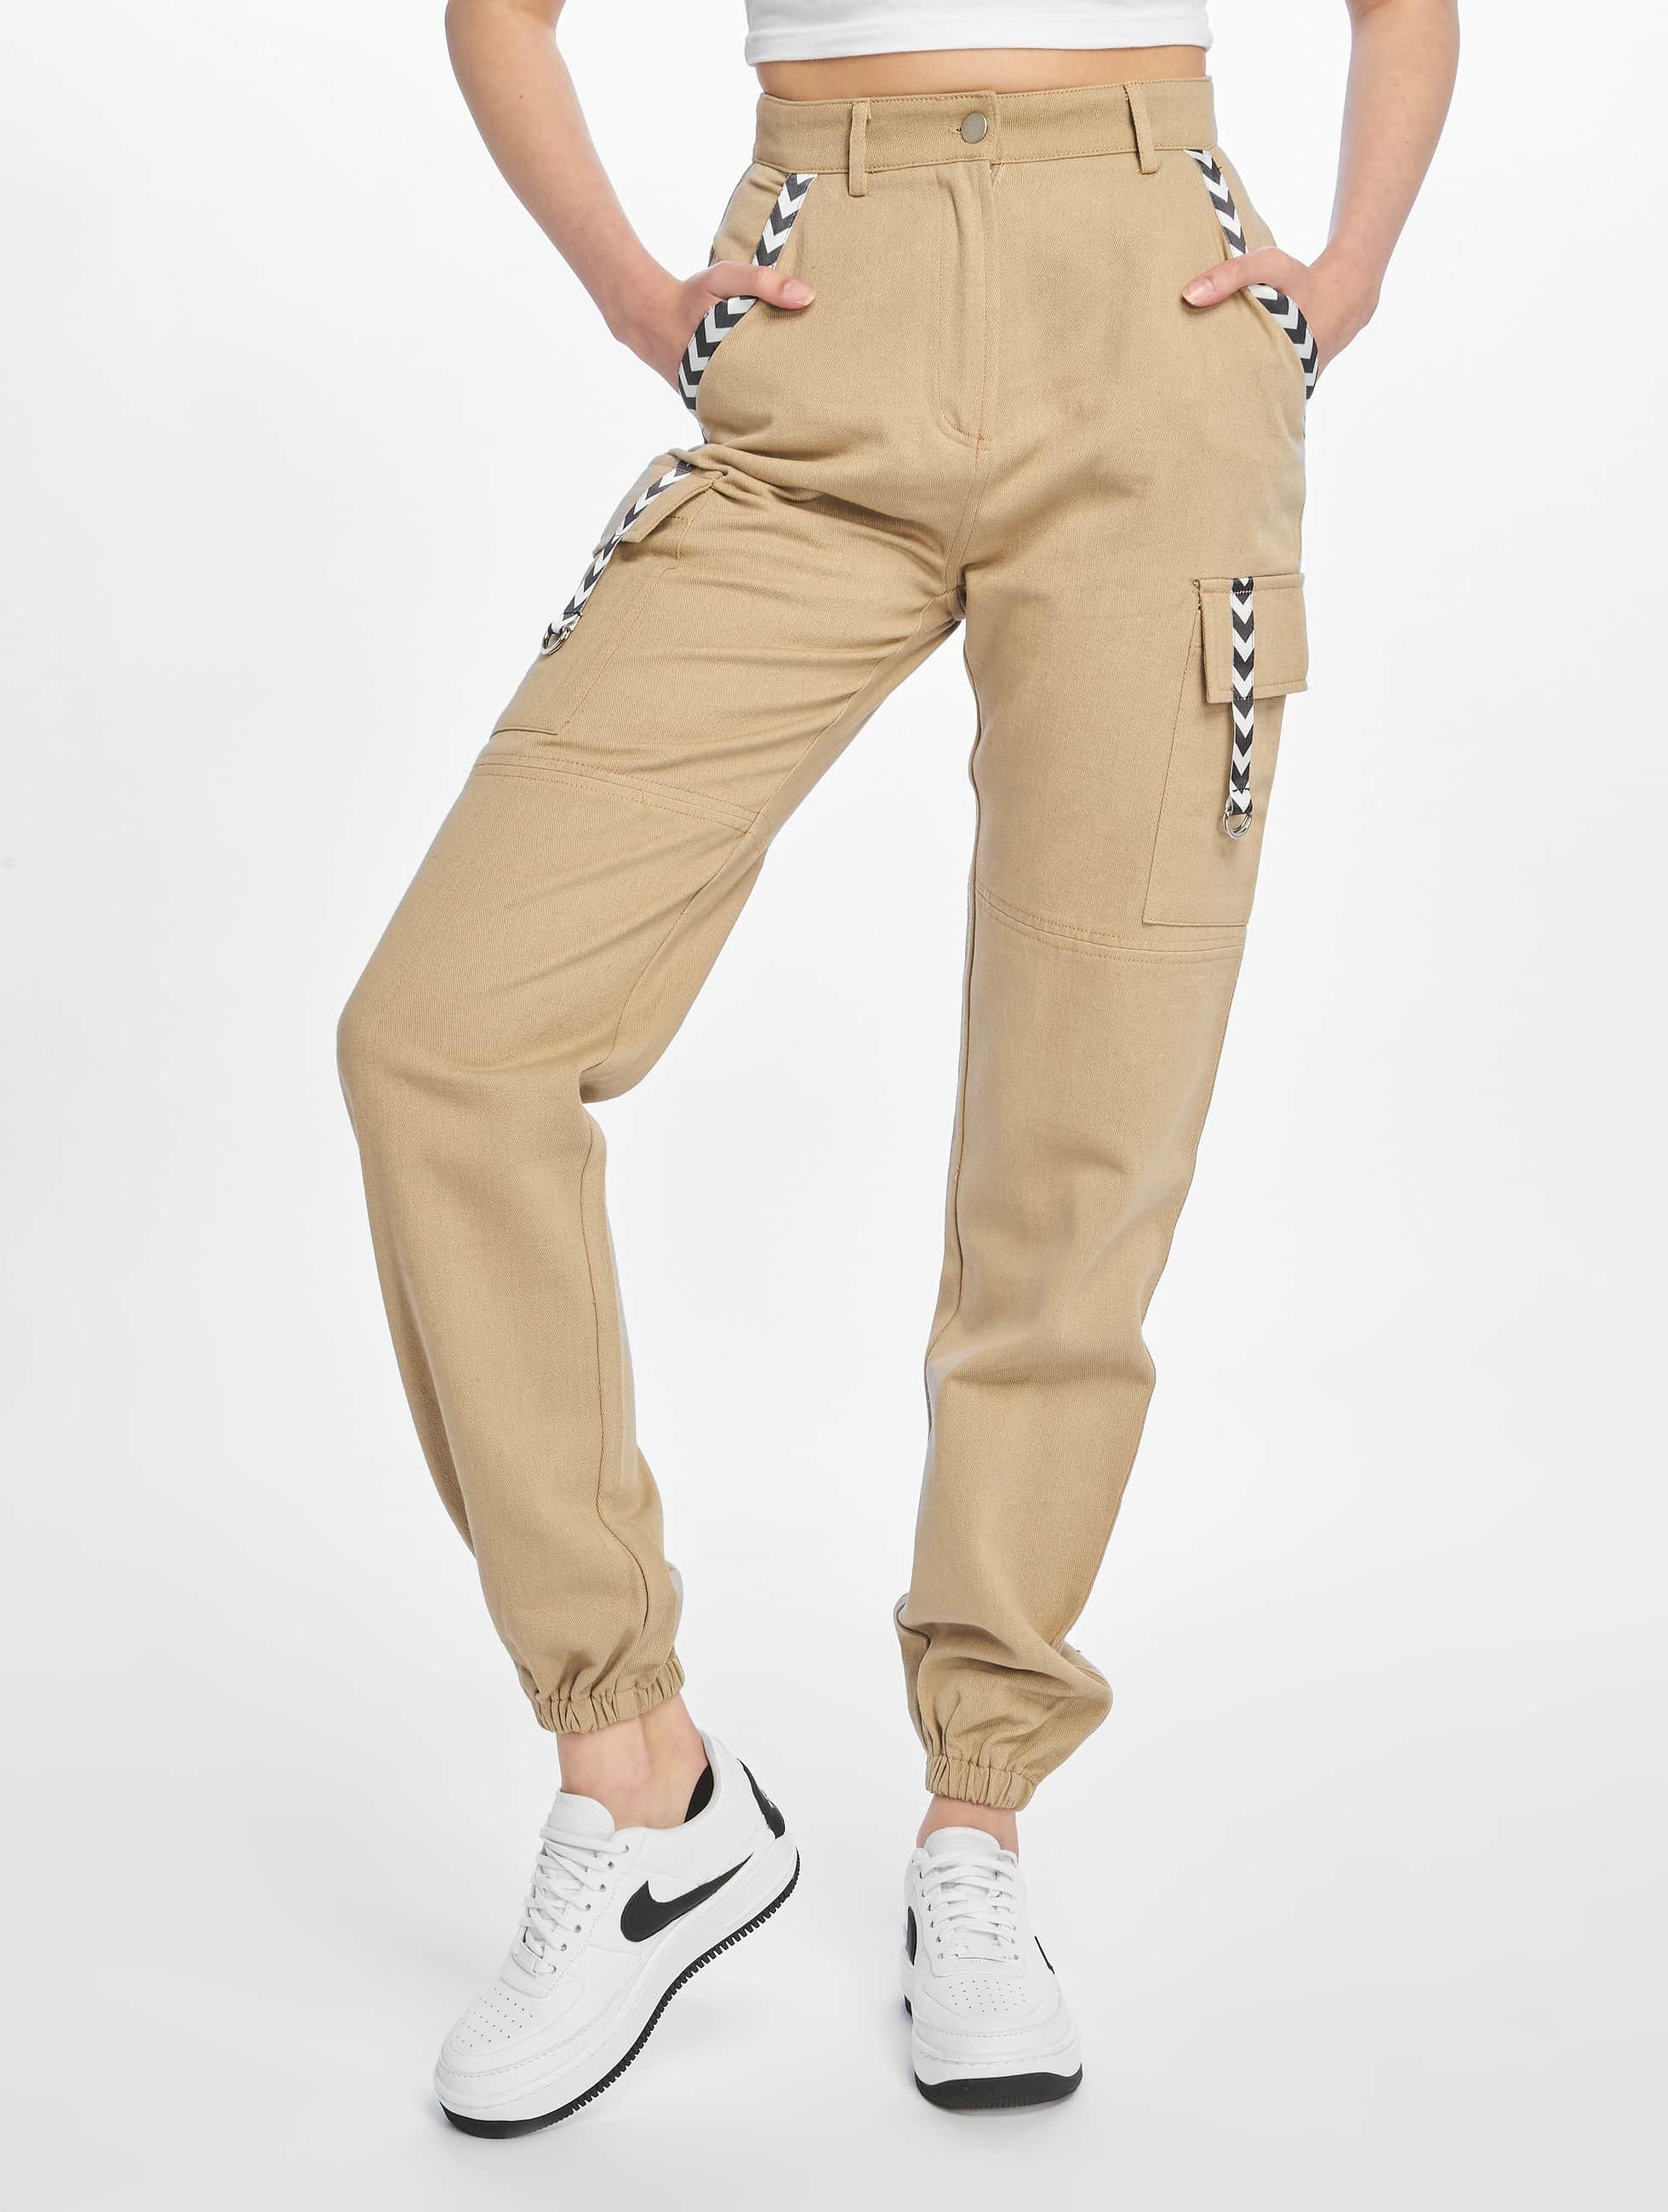 0d2bef37f2db1 Missguided | Sand Sports Tape beige Femme Pantalon cargo